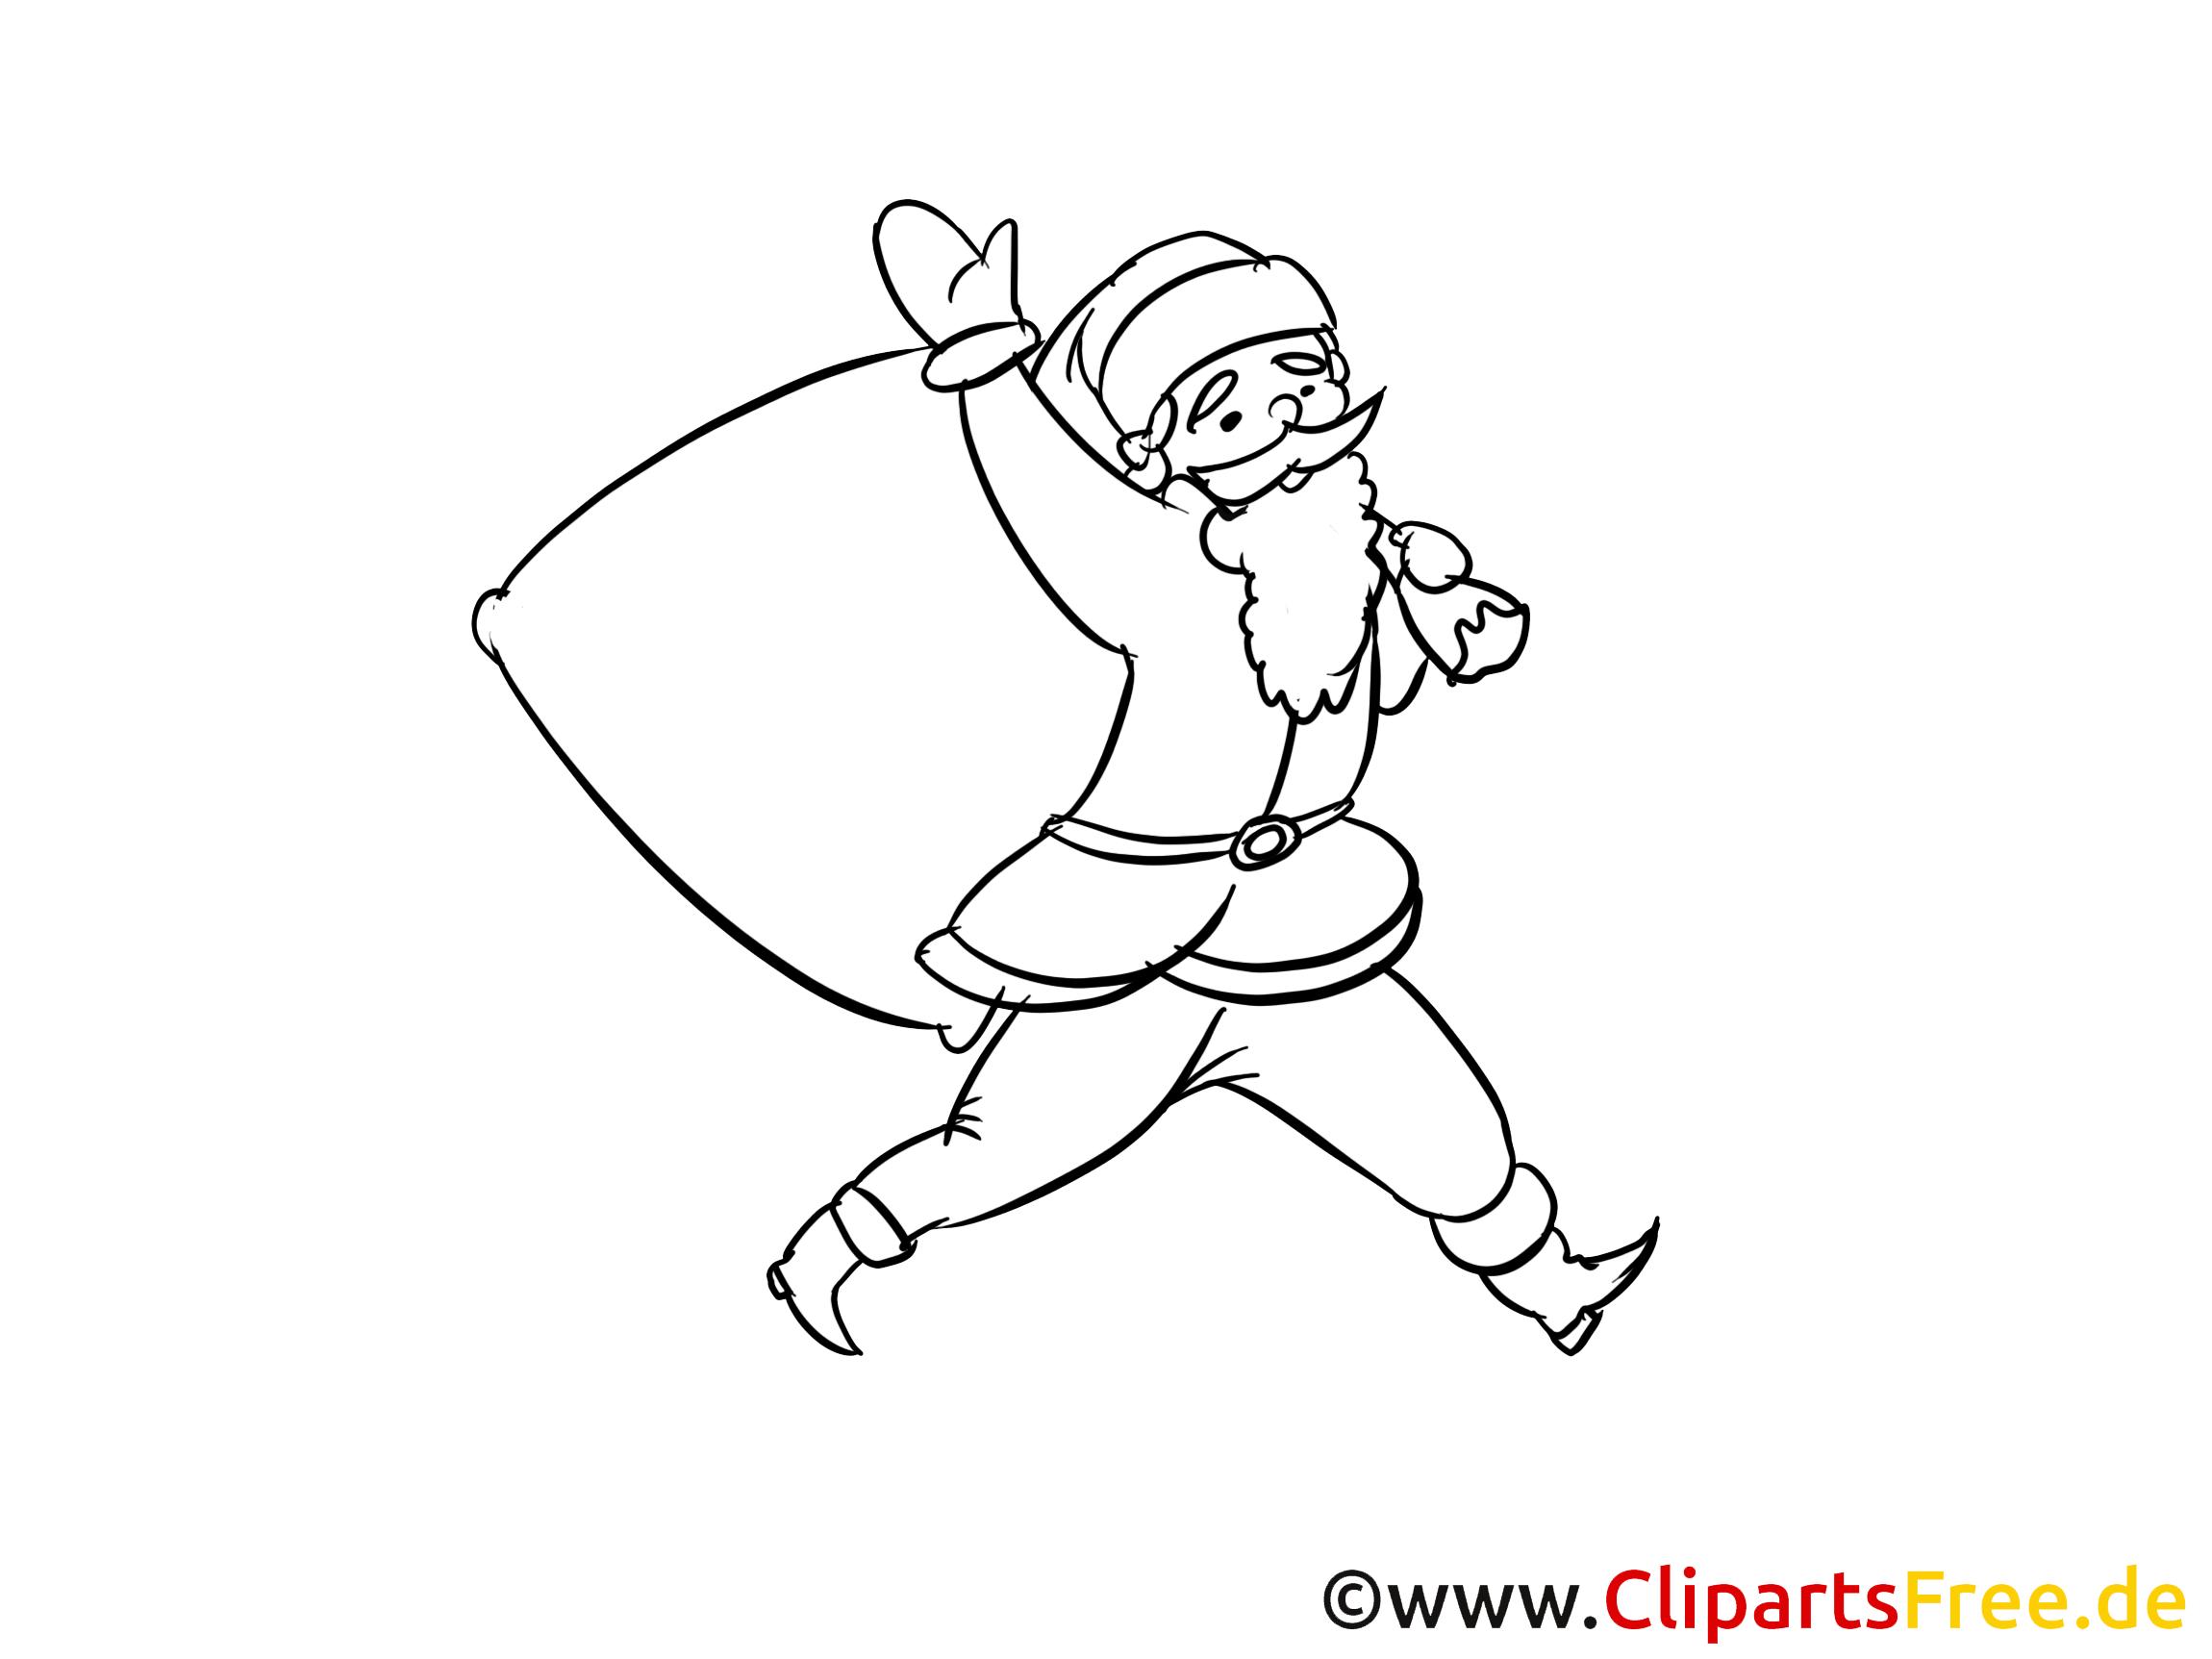 Santa kleurplaat om in te kleuren